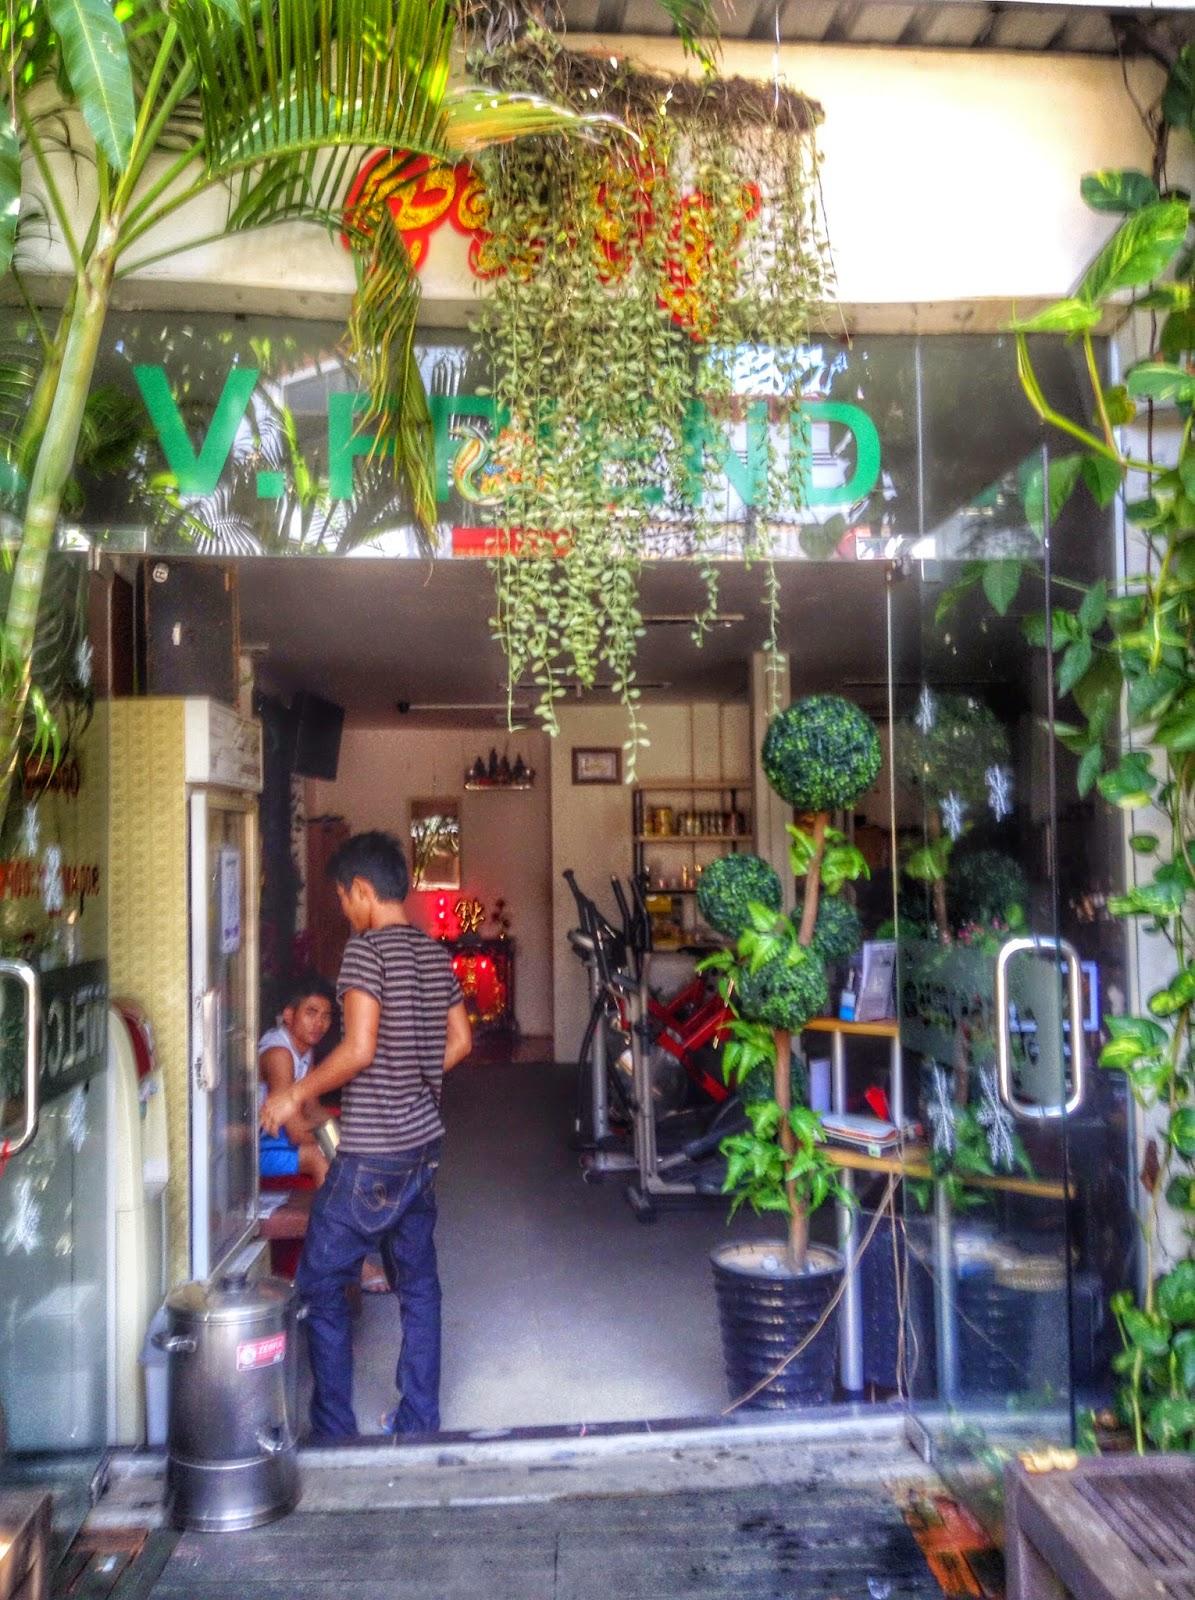 Gym in Phnom Penh, Cambodia - V-Friend Gym